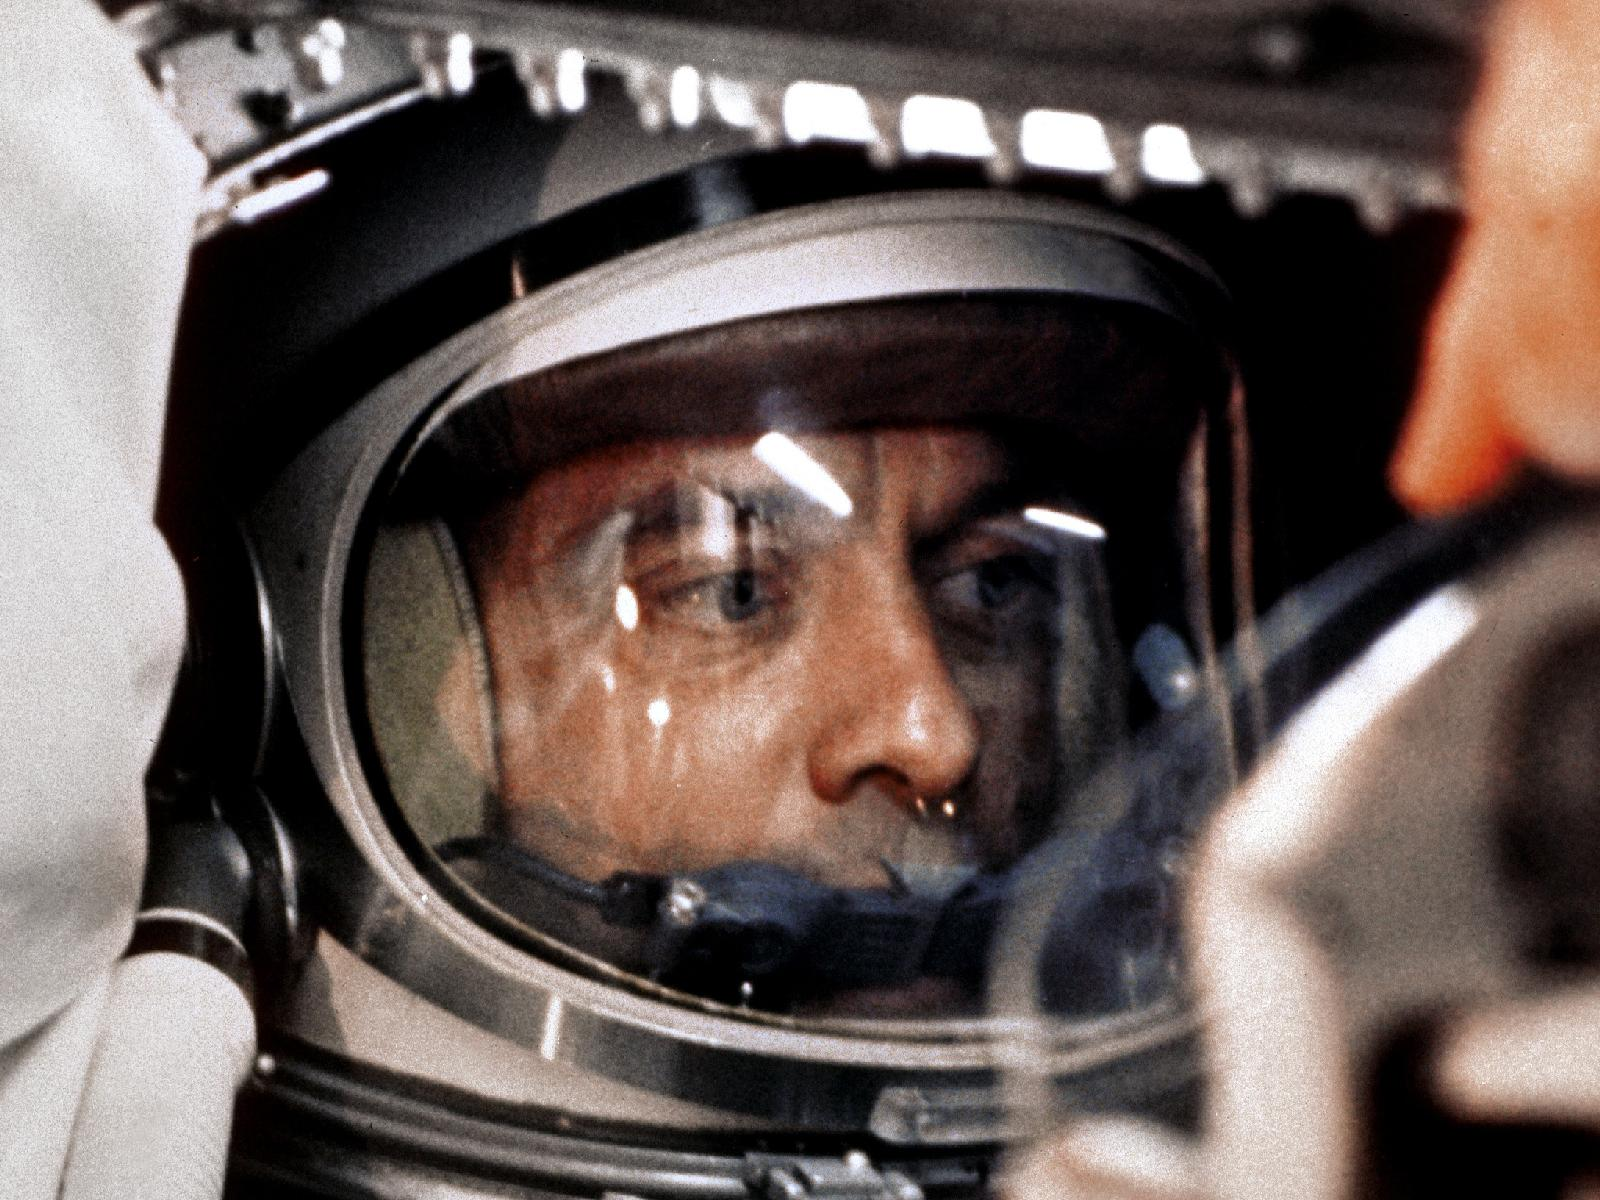 May_5,_1961_-_Astronaut_Alan_Shepard,_First_American_in_Space.jpg